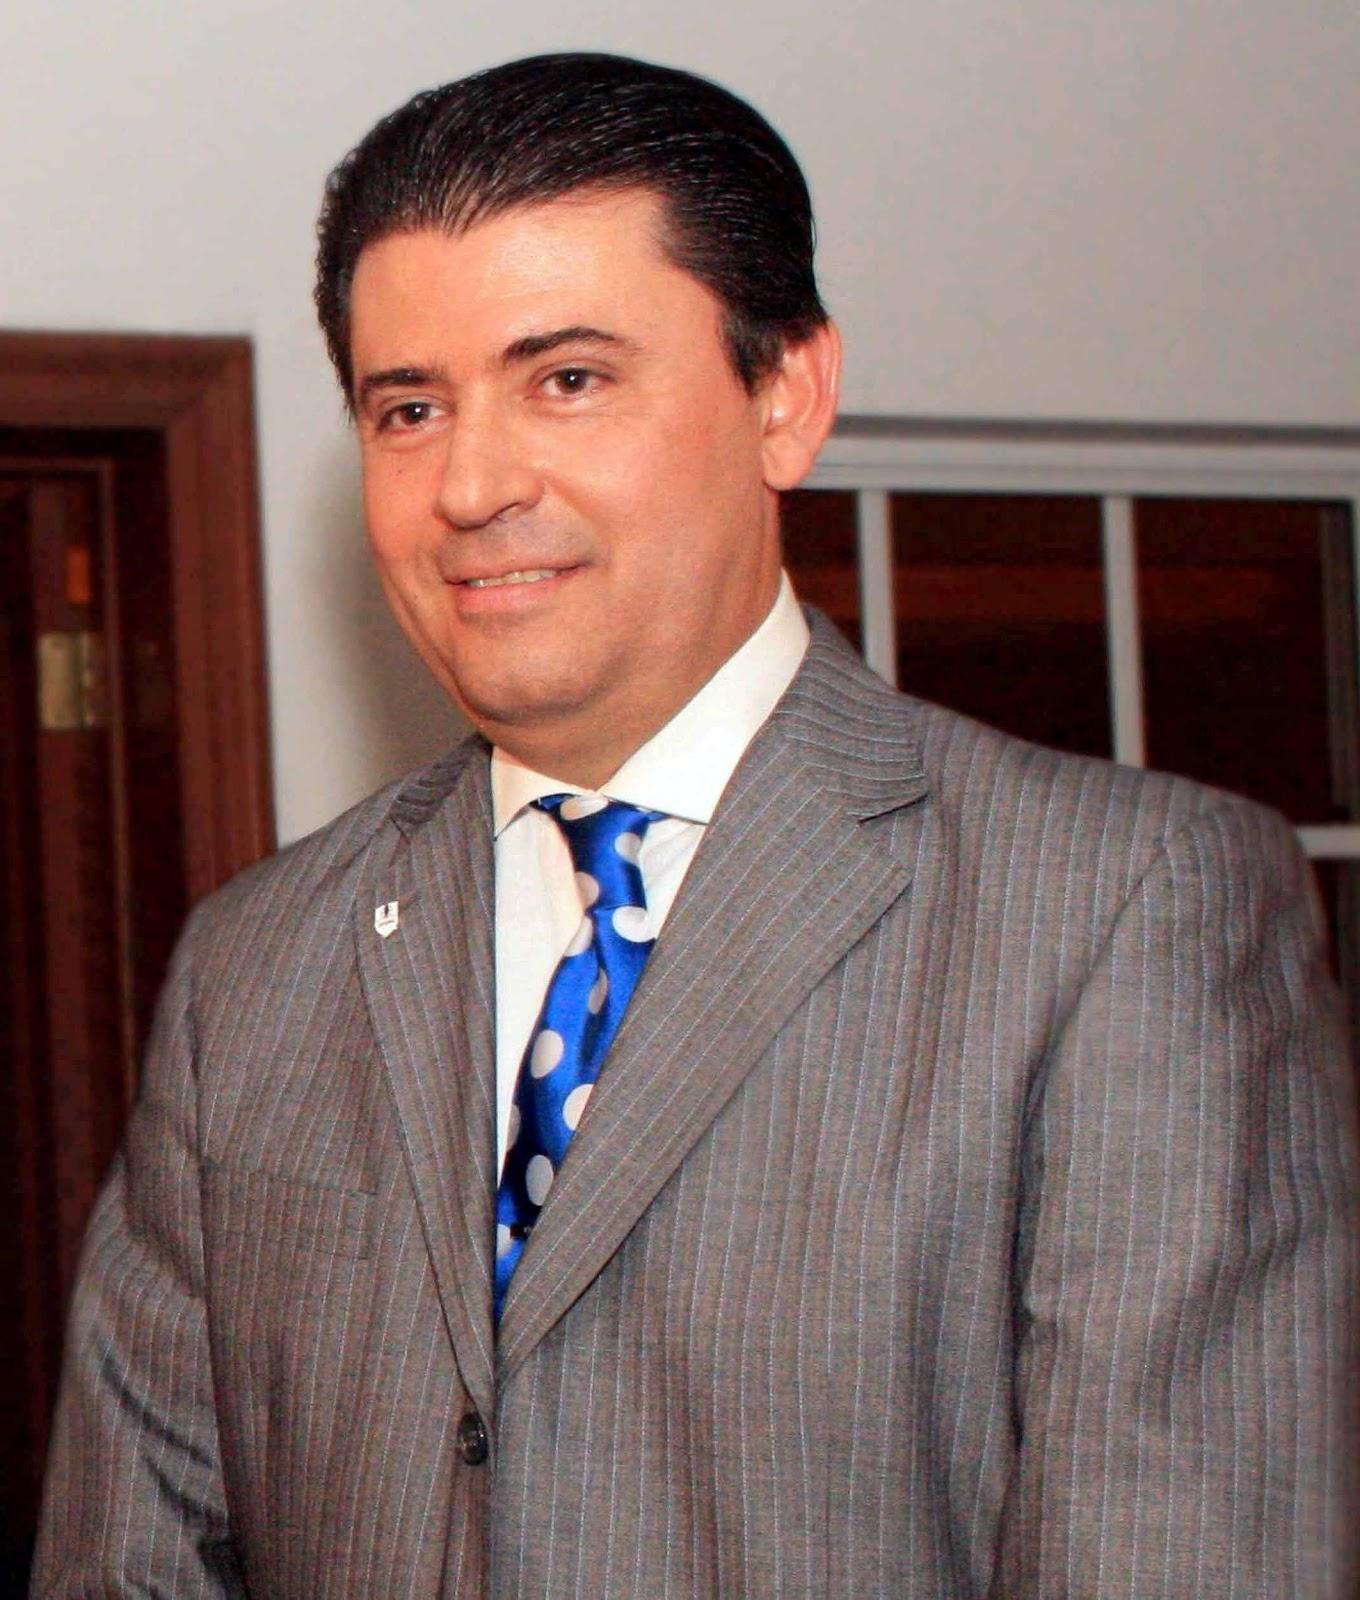 Directorio Nombres De Empresas En Repblica Dominicana ... - photo#19